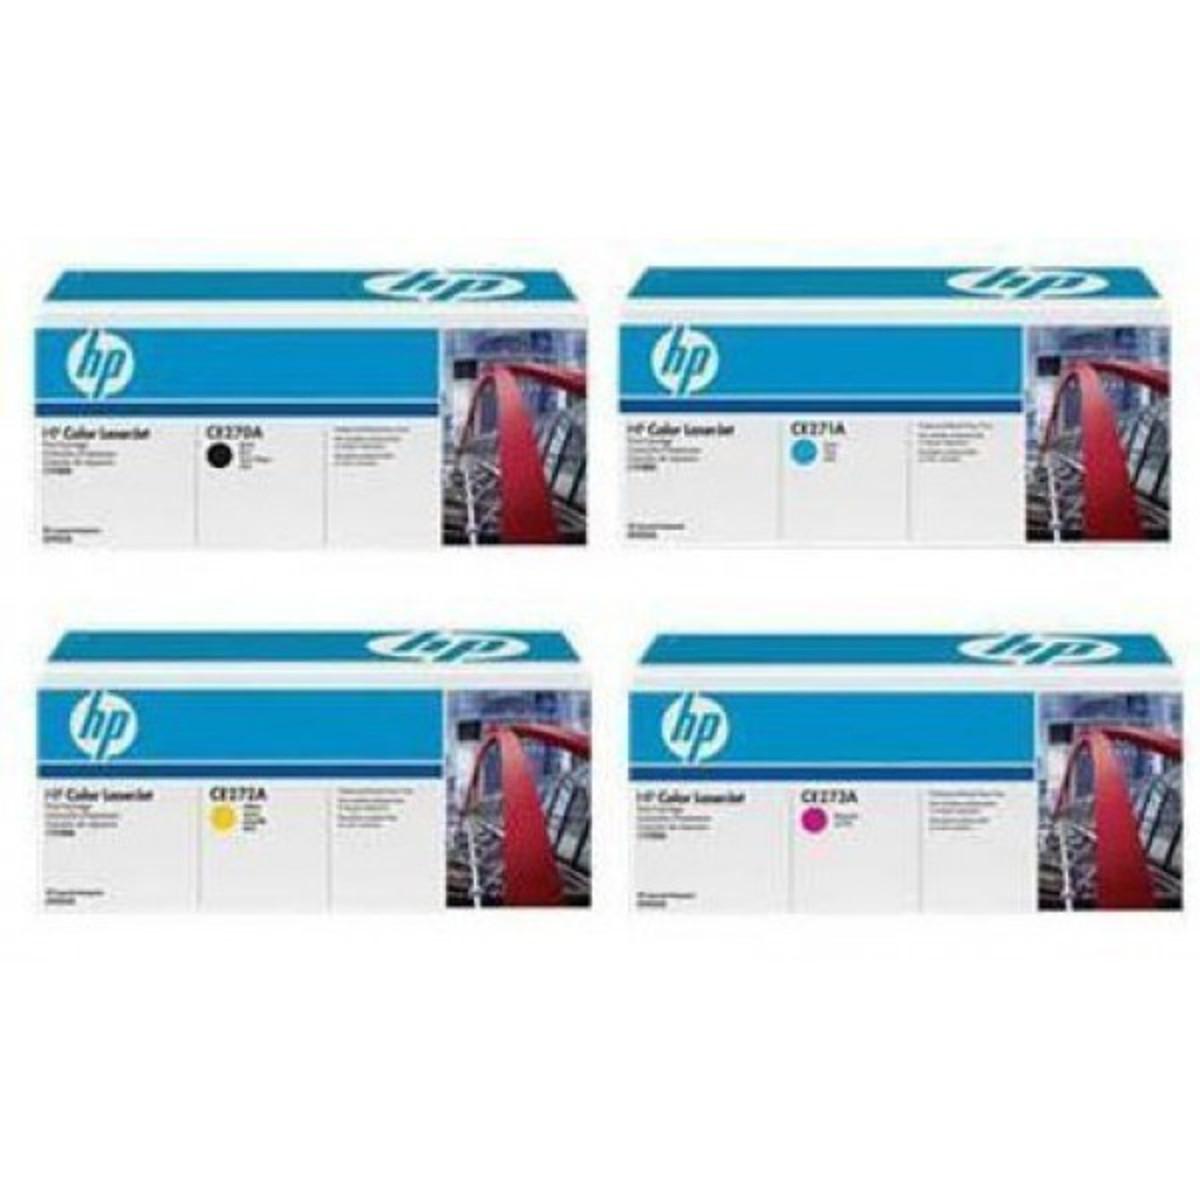 HP 650 (CE270) Bundle Pack